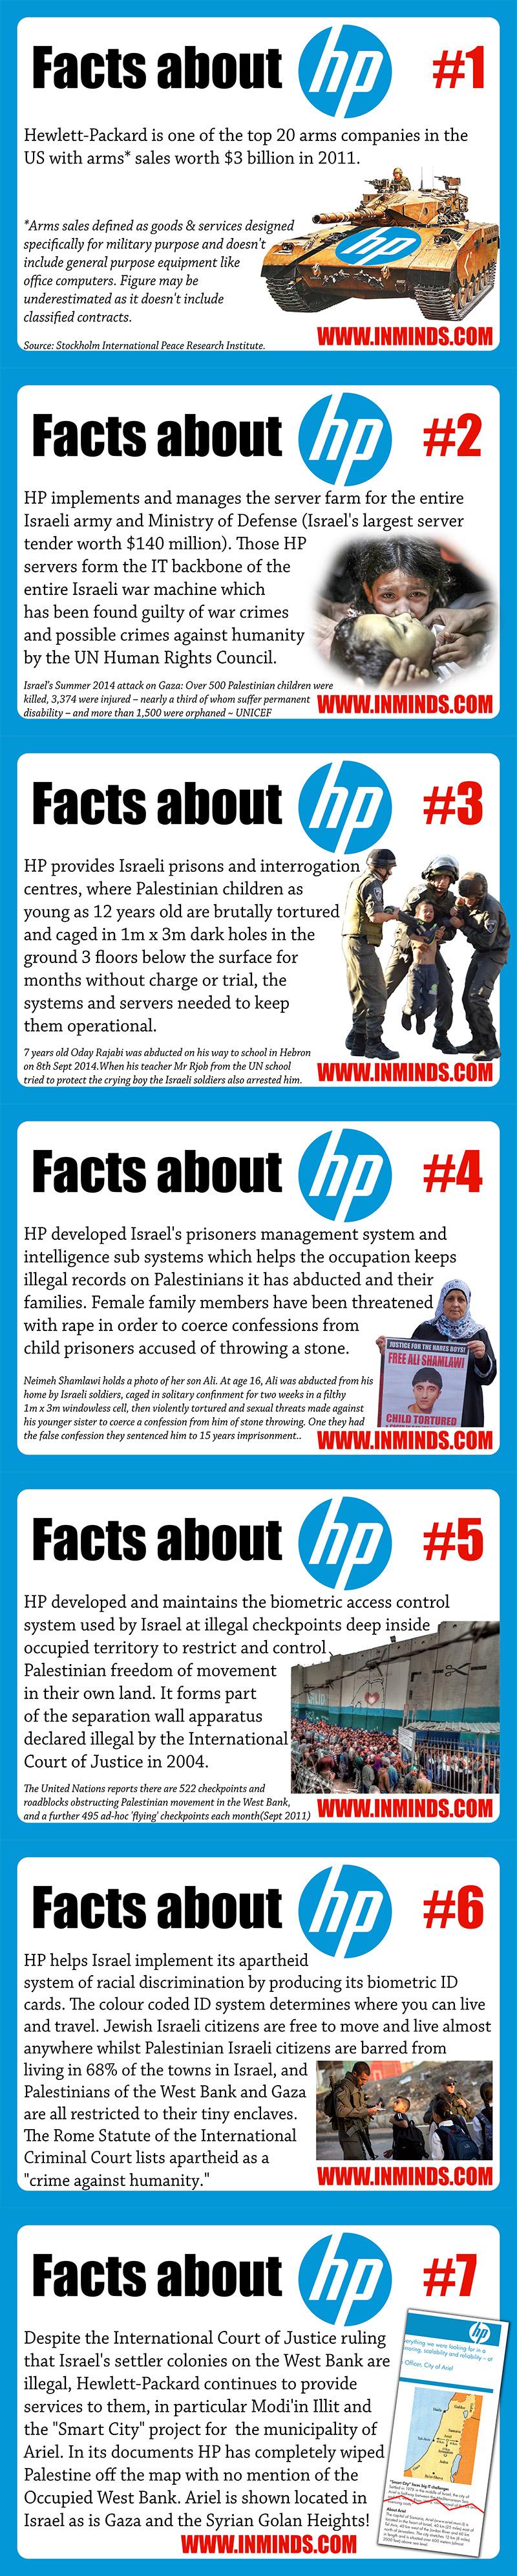 Boycott Israel News Why Boycott Hp